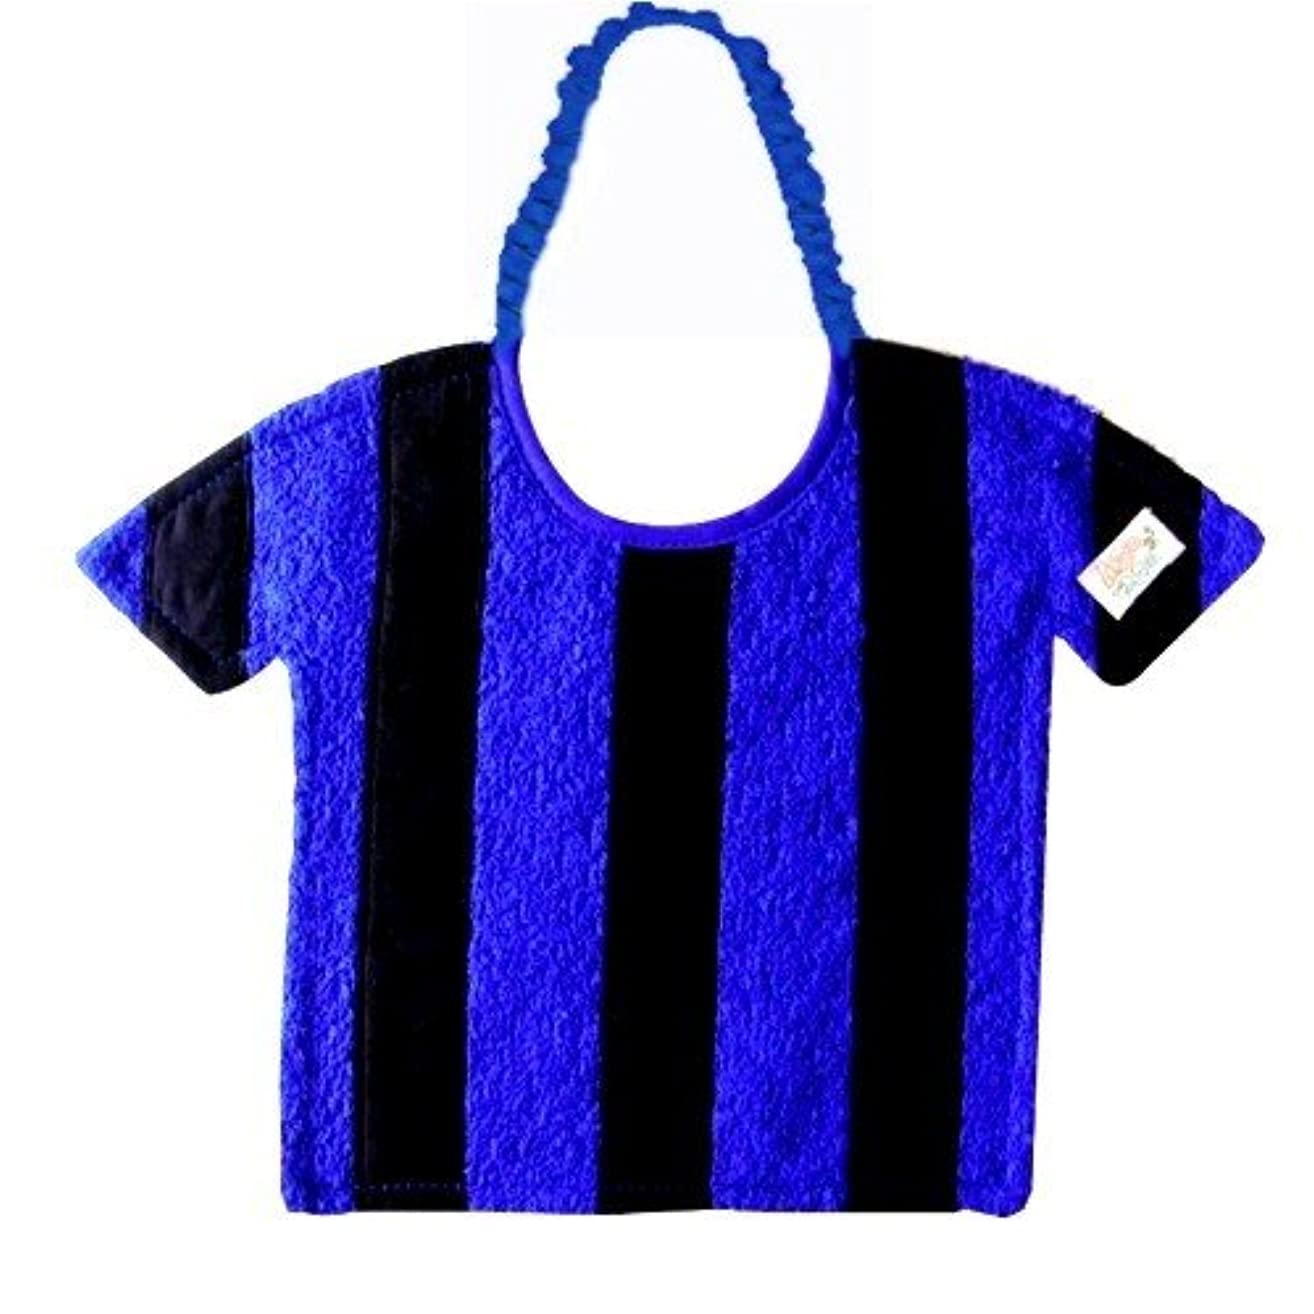 Zigozago - Baby Bib Black and Blue stripes t-shirt - Tie: Elastic - One Size